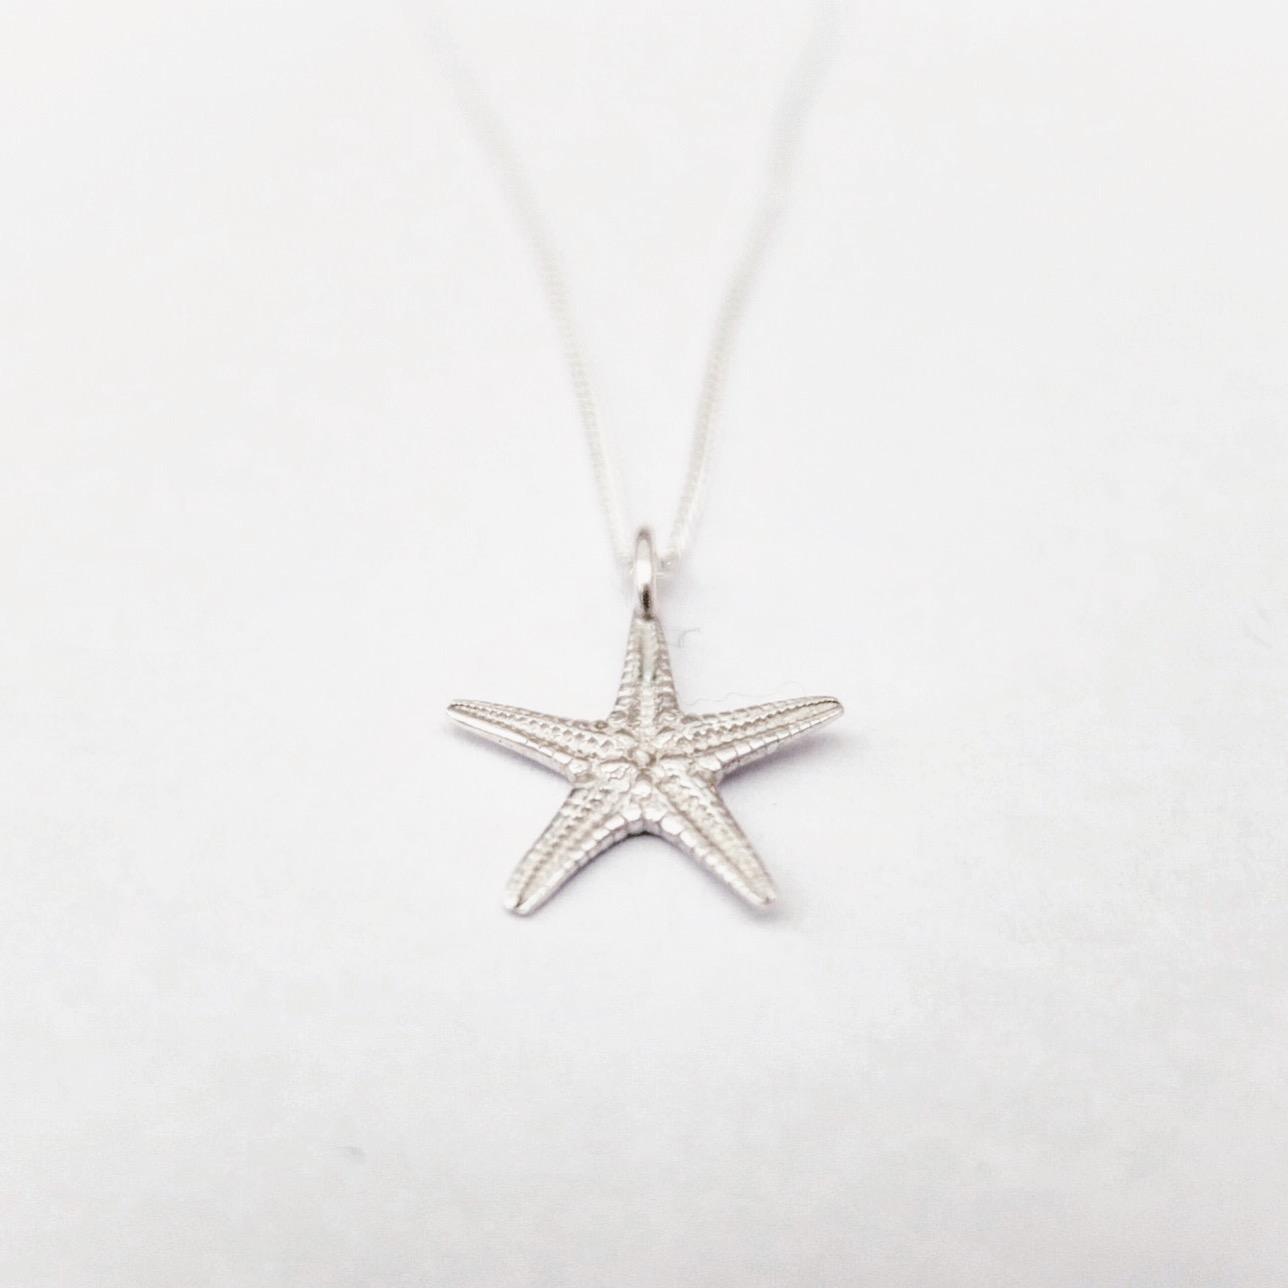 Silver Starfish Pendant / Necklace